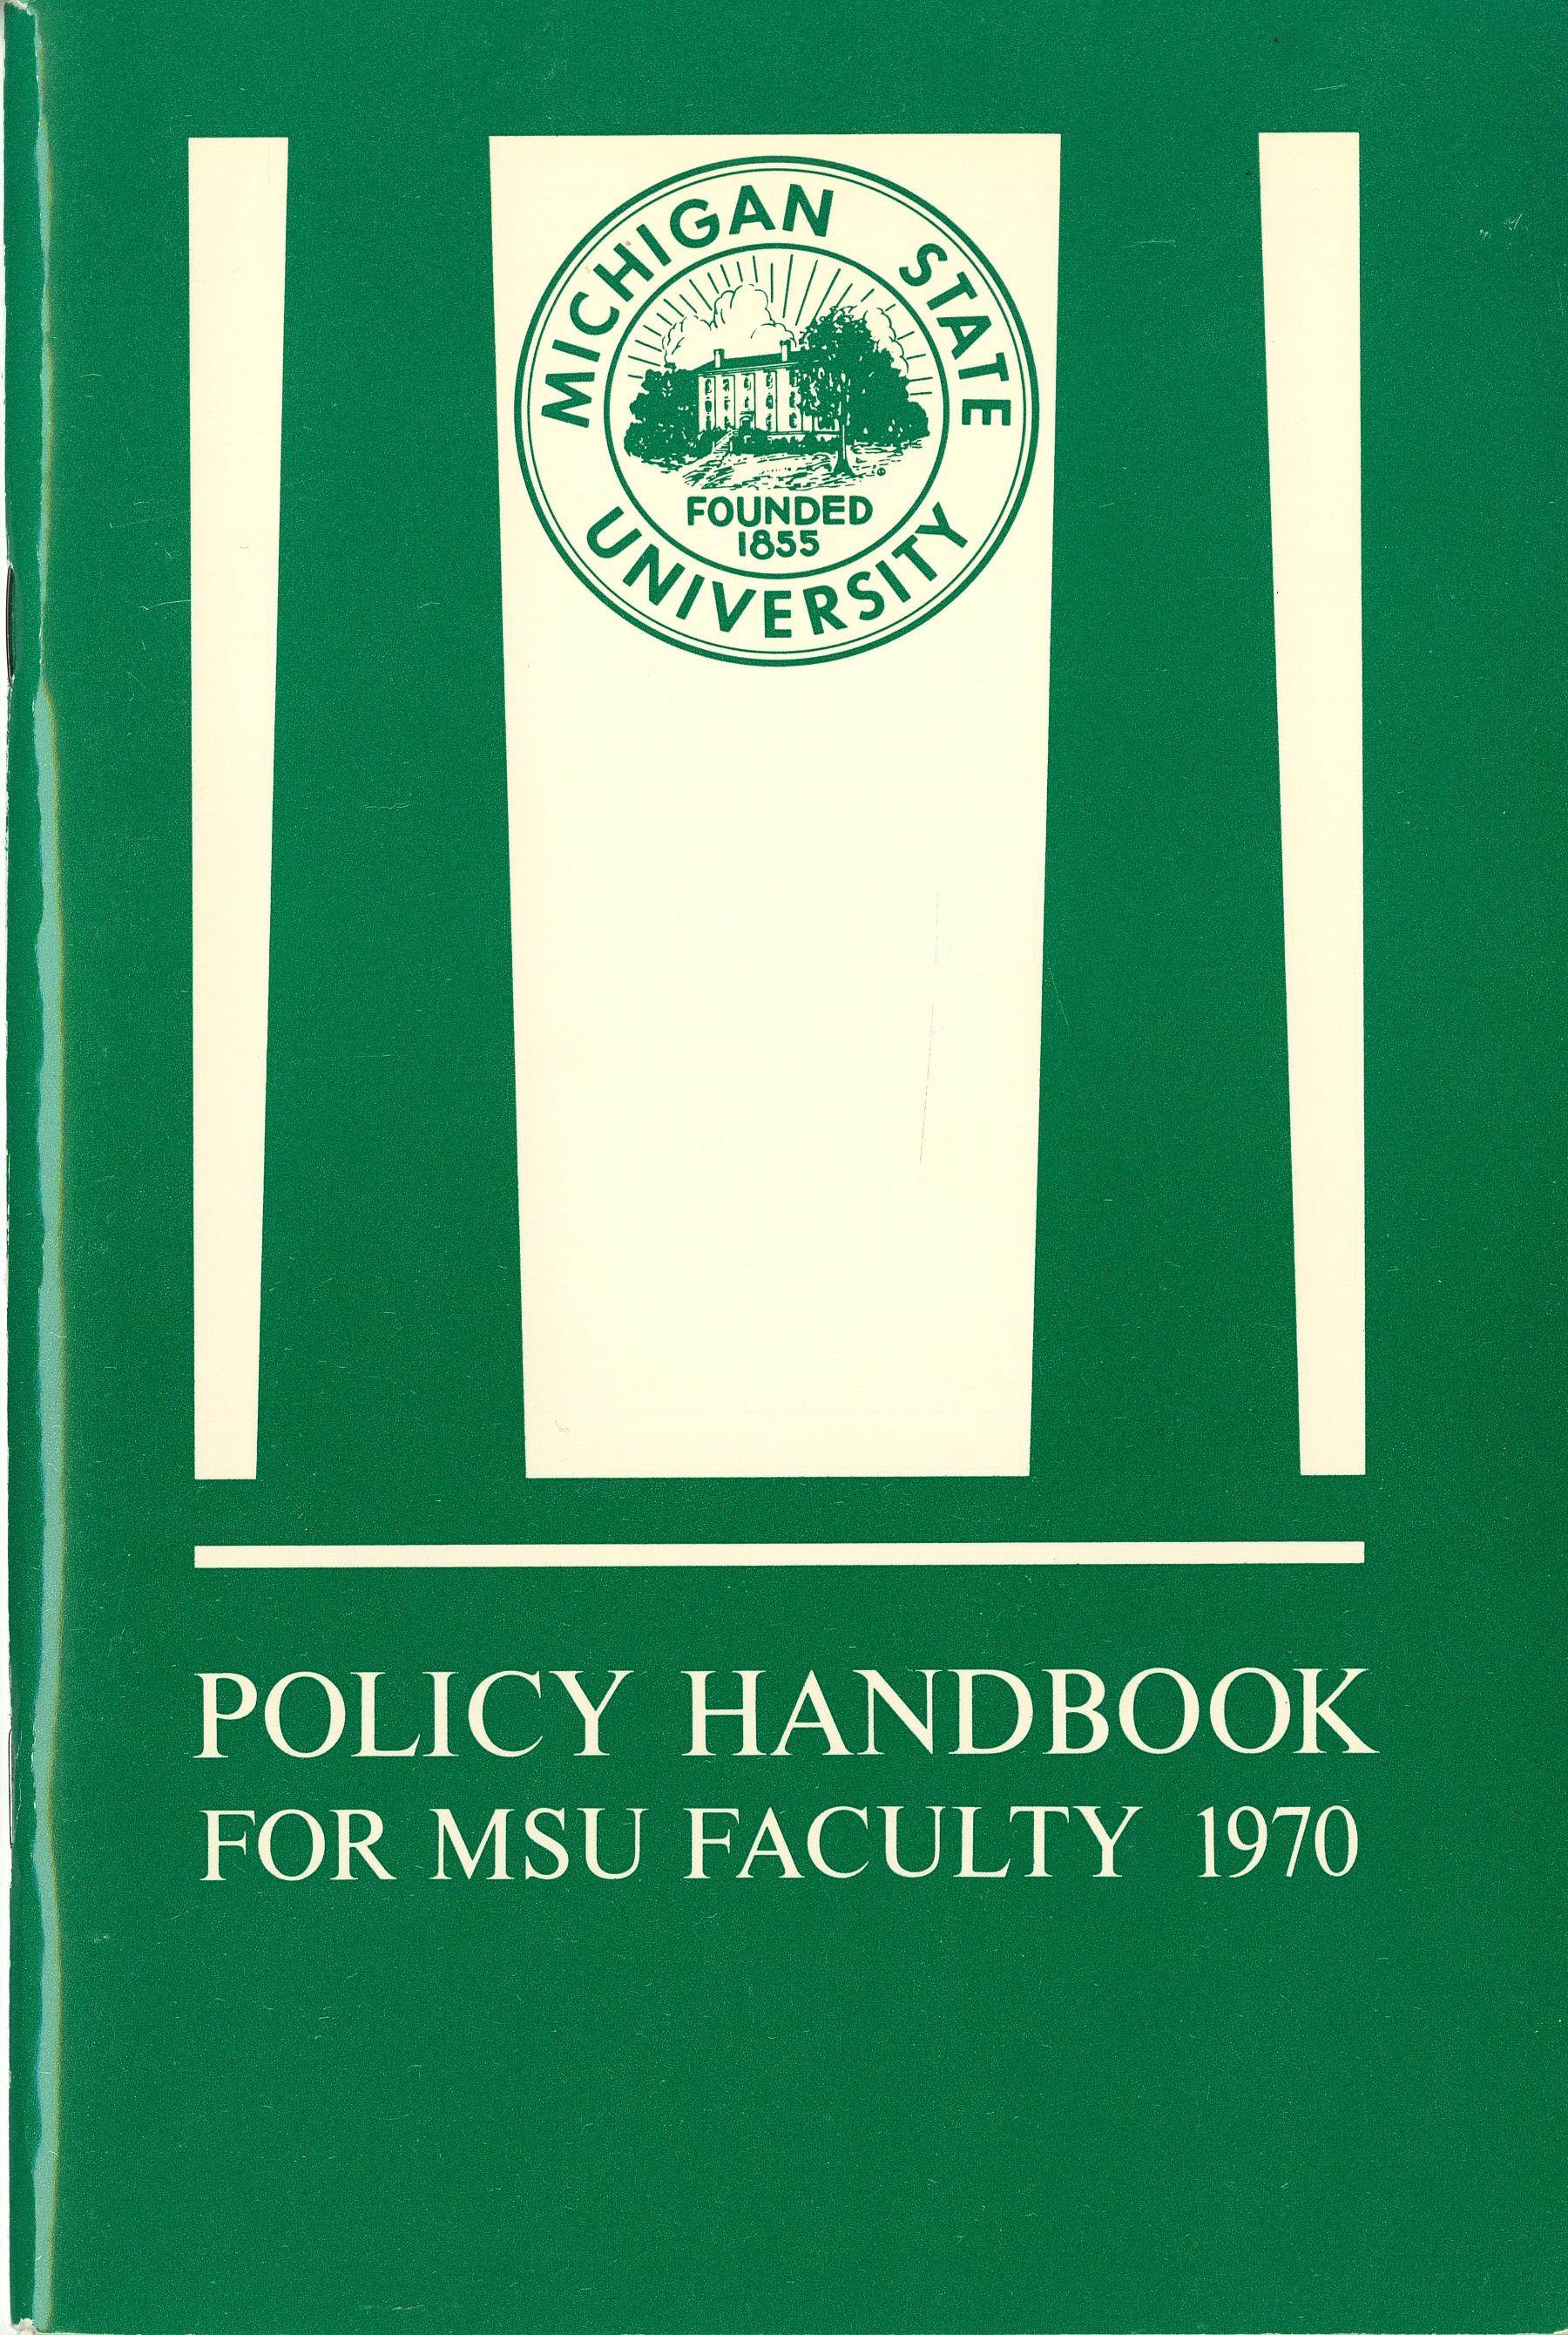 Faculty Handbook, 1970